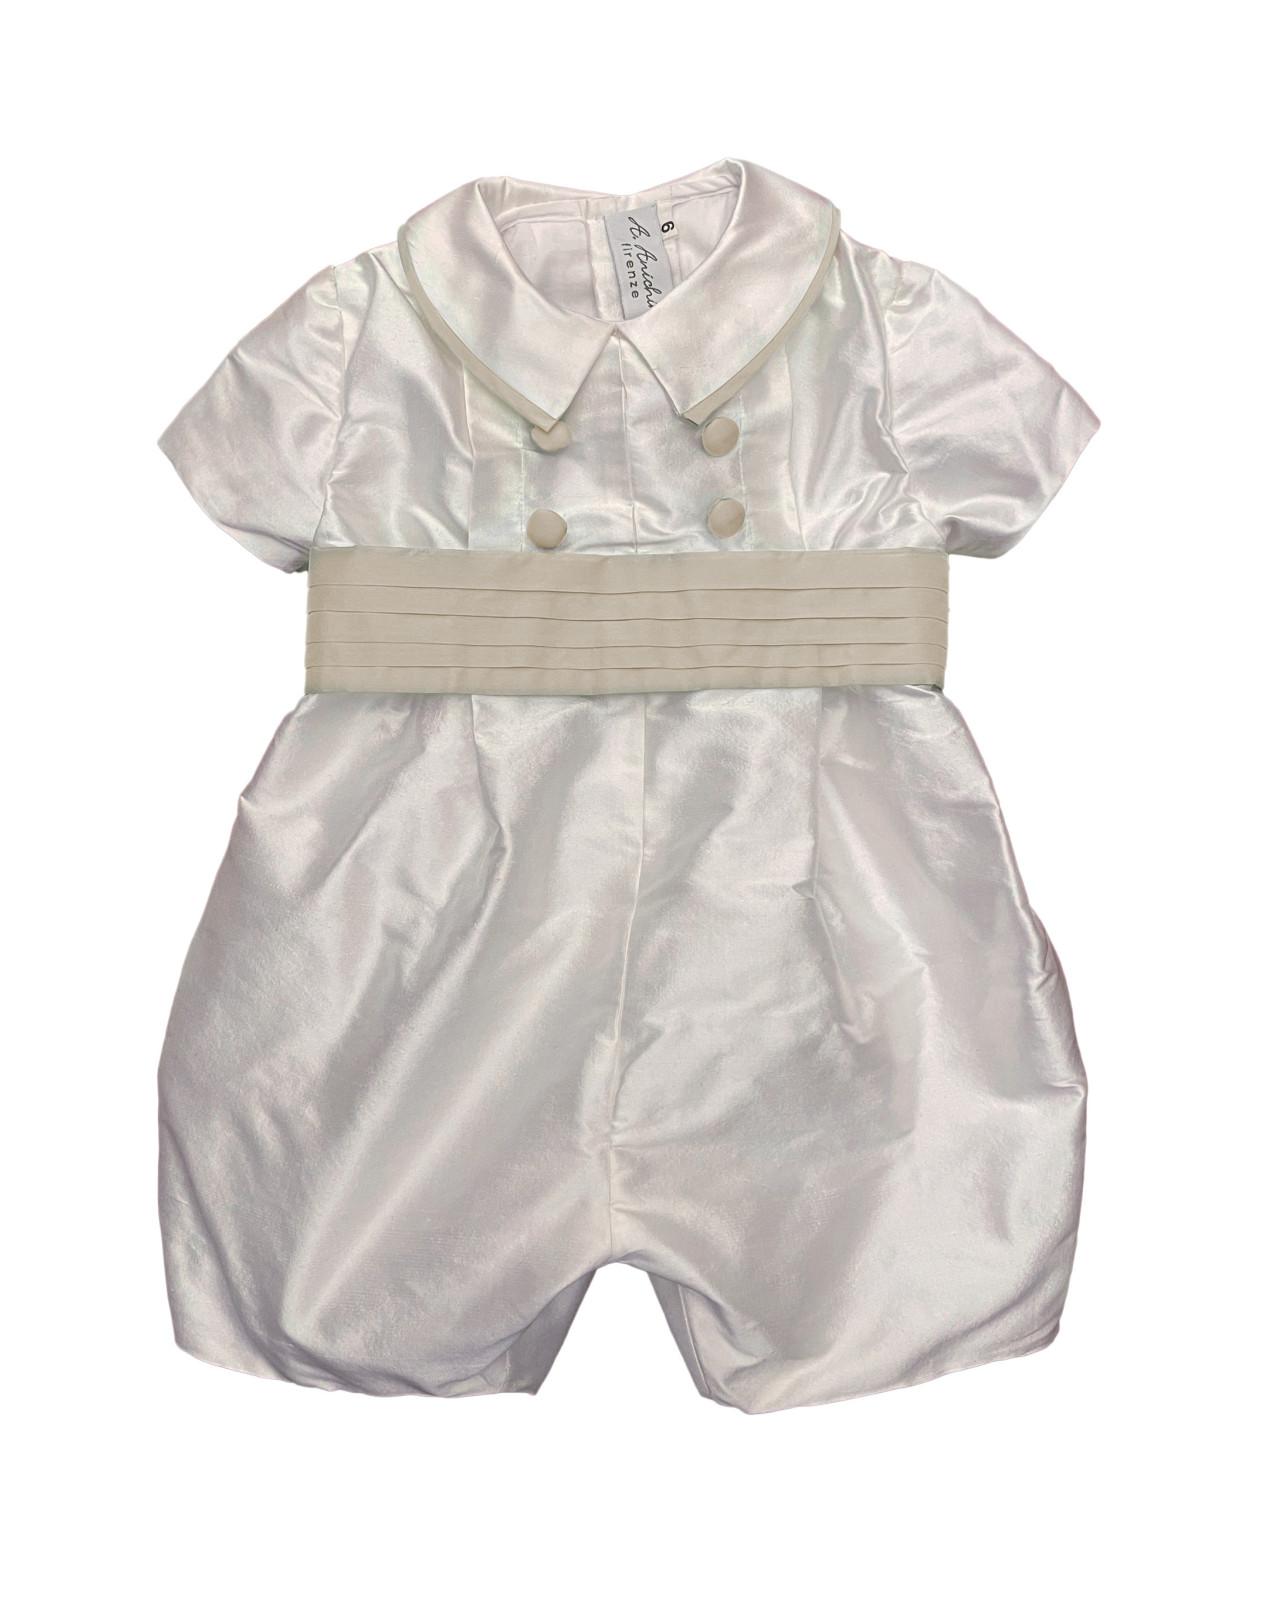 Baby boy christening and baptismal romper cream belt